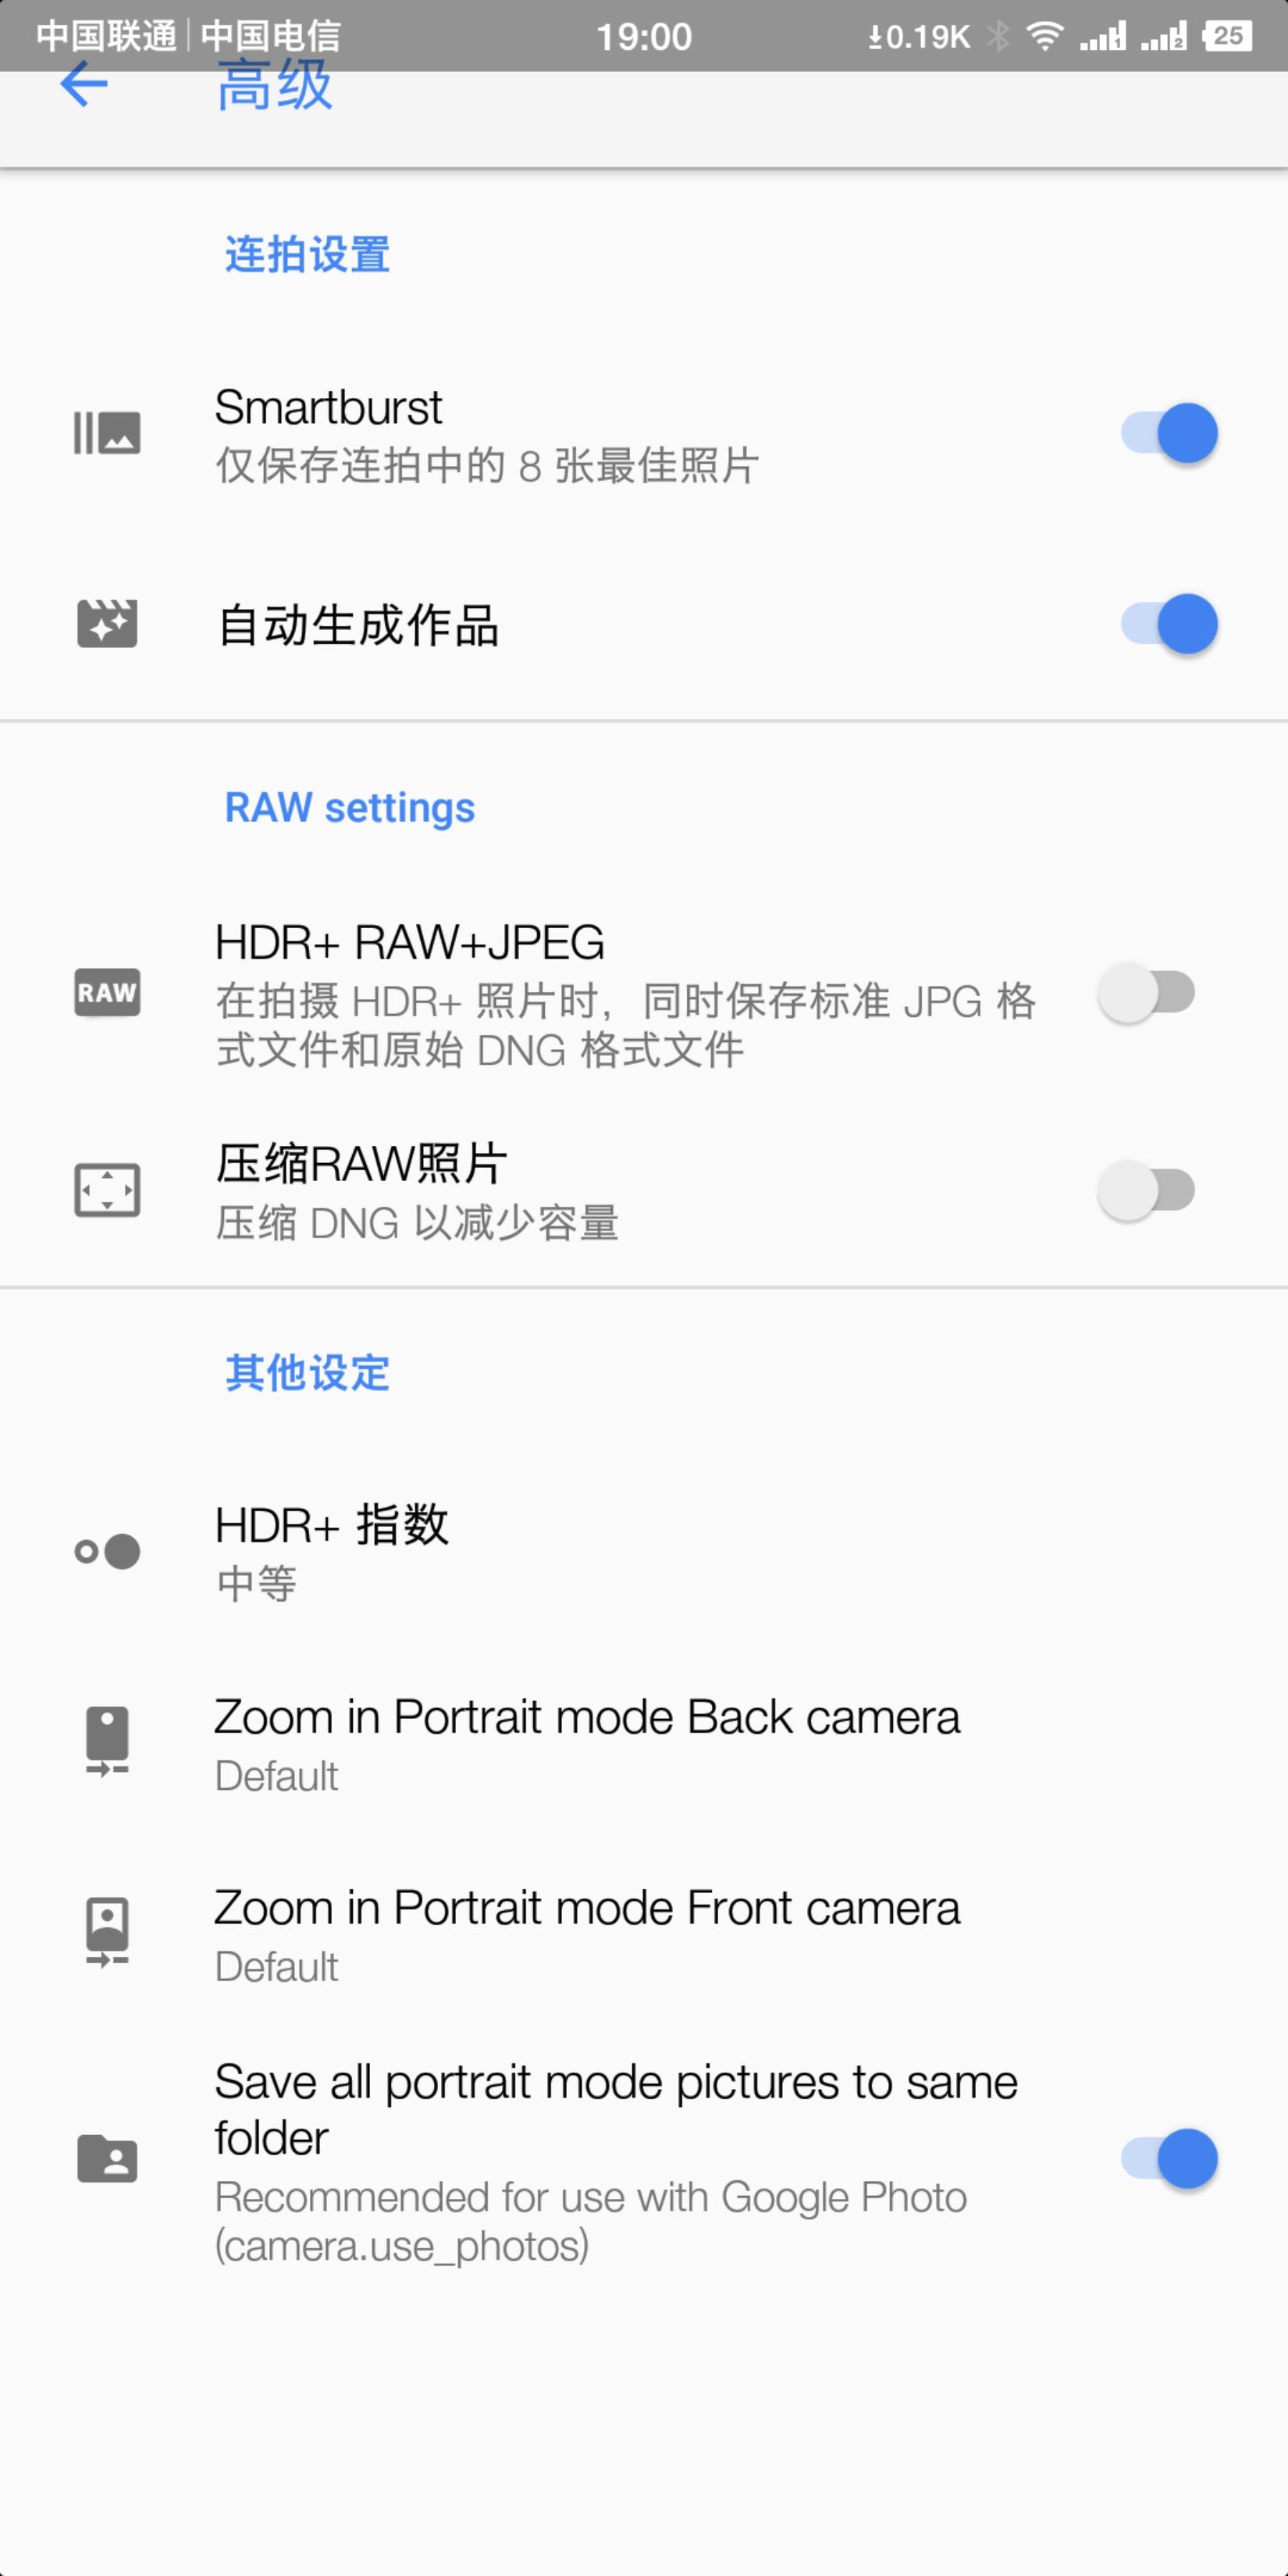 Screenshot_2018-12-01-19-00-33-194.png